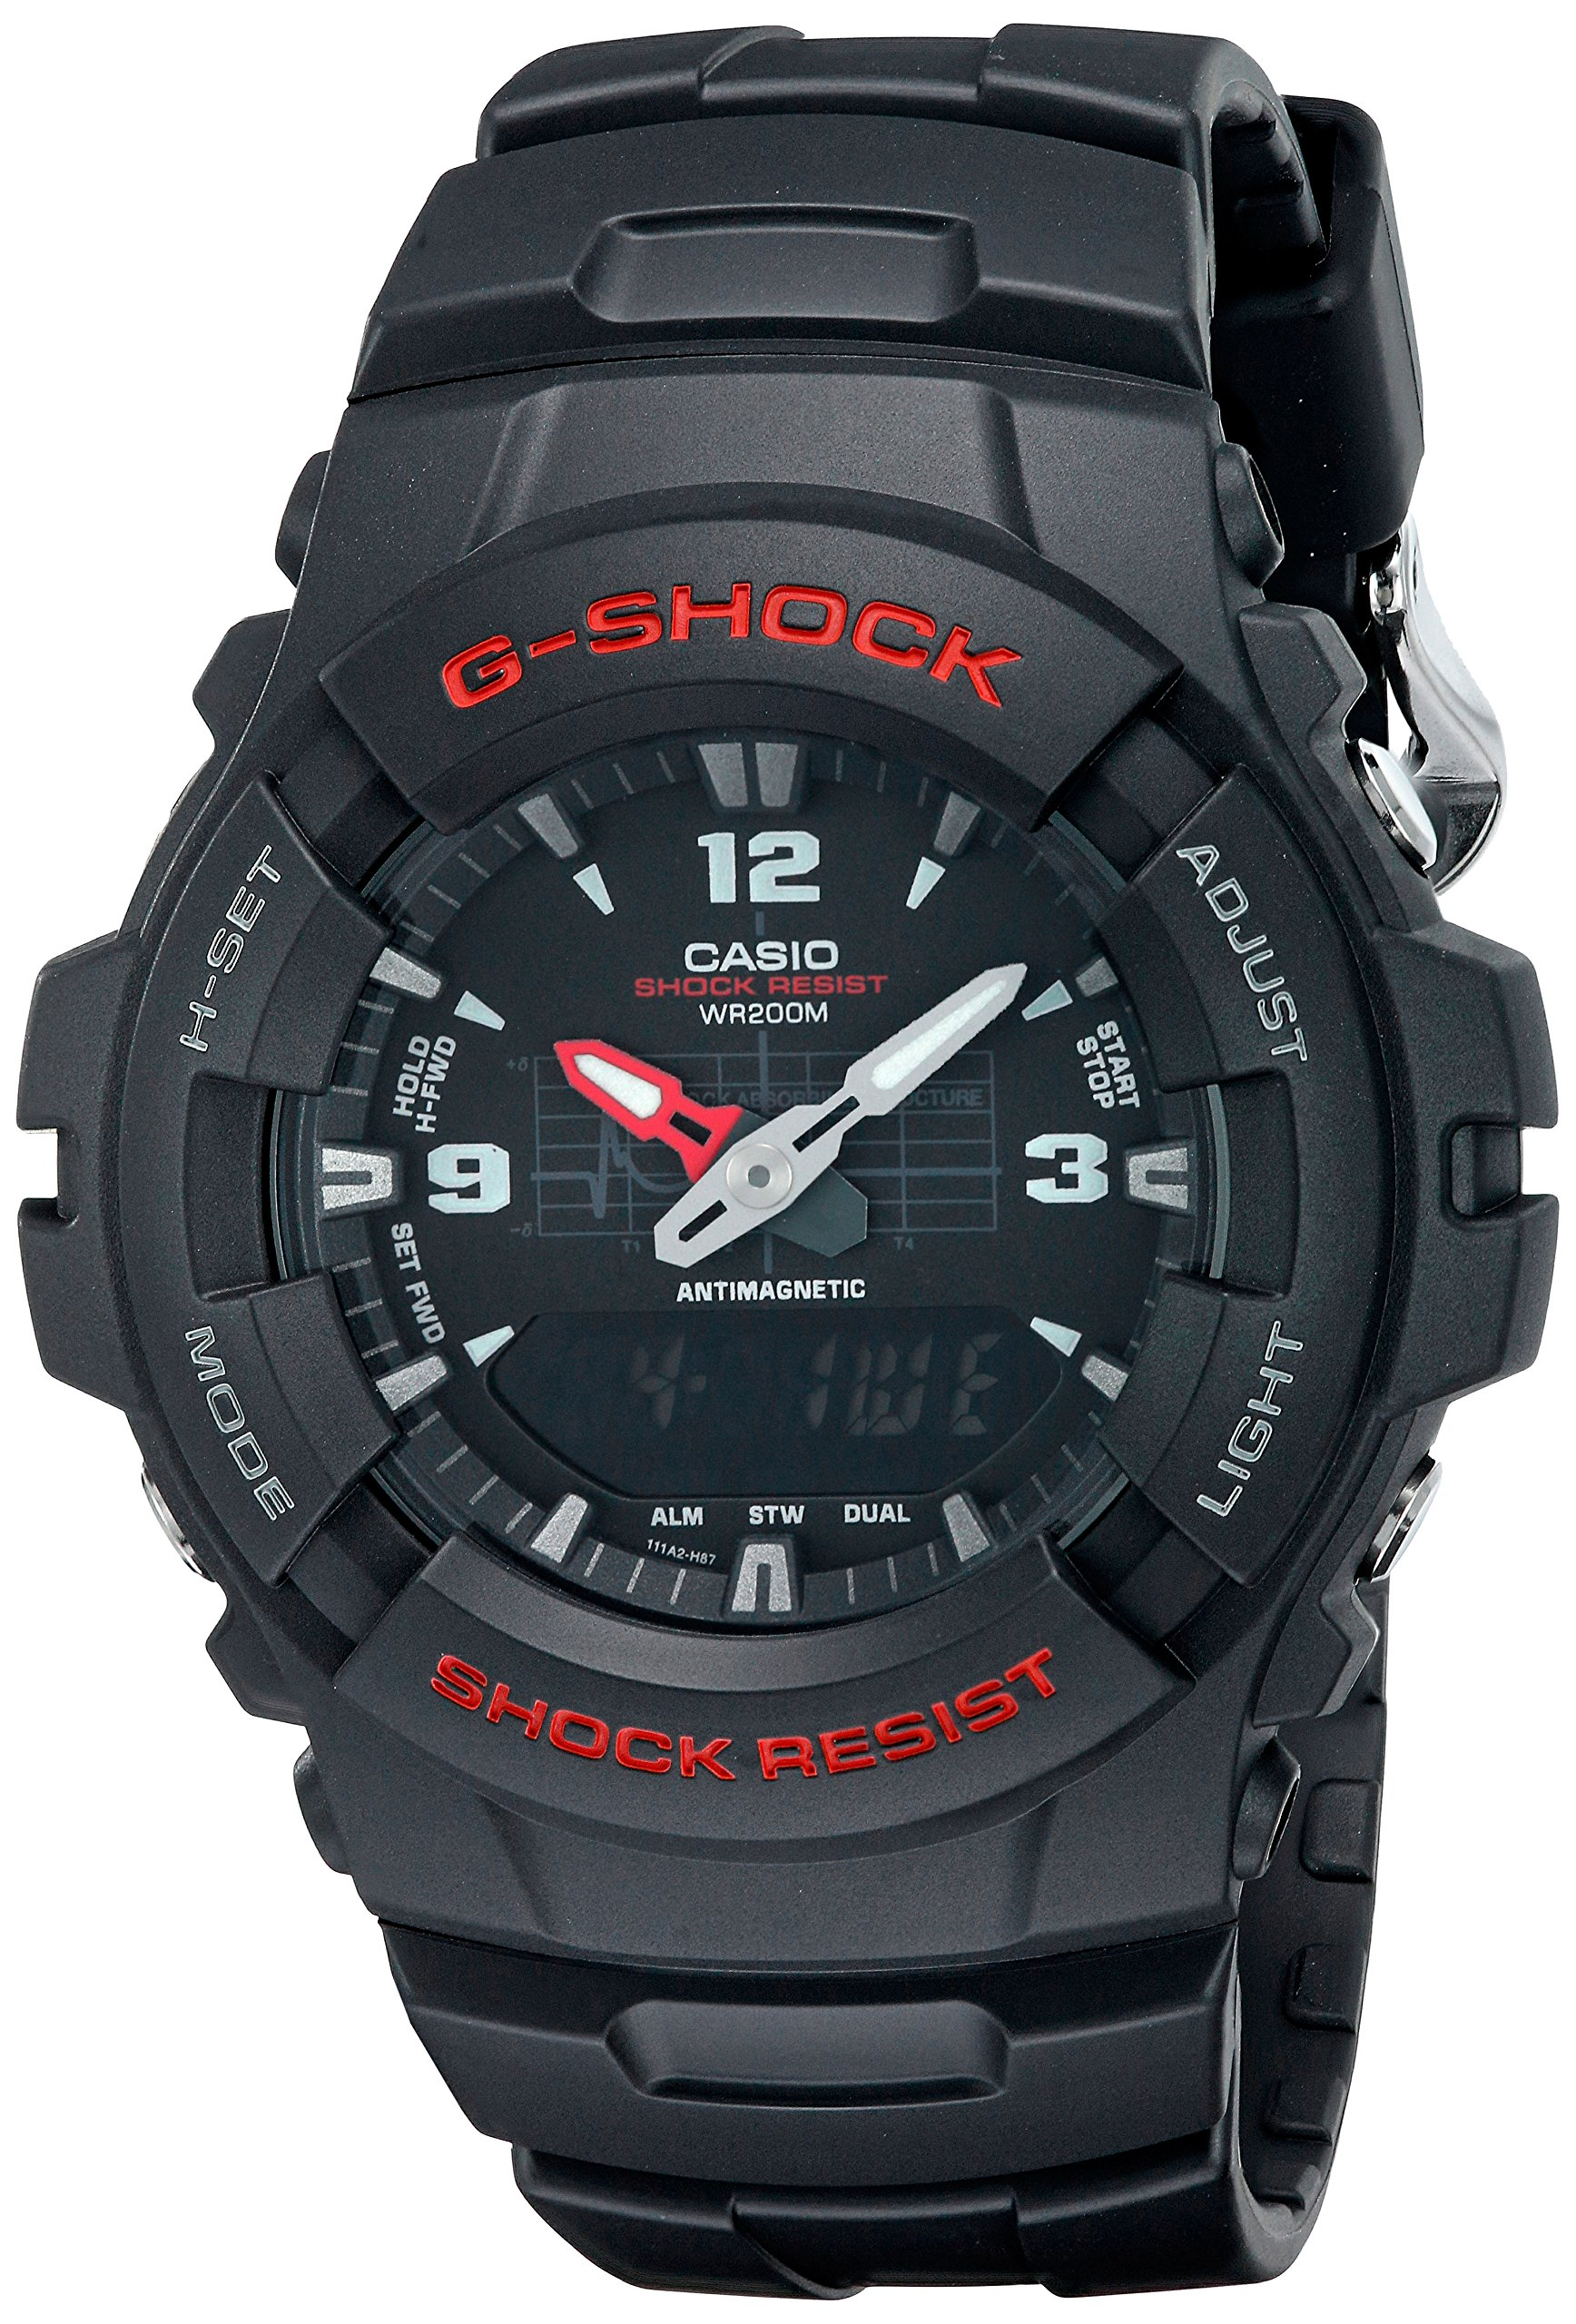 Casio Men's G-Shock G100-1BV Black Resin Sport Watch